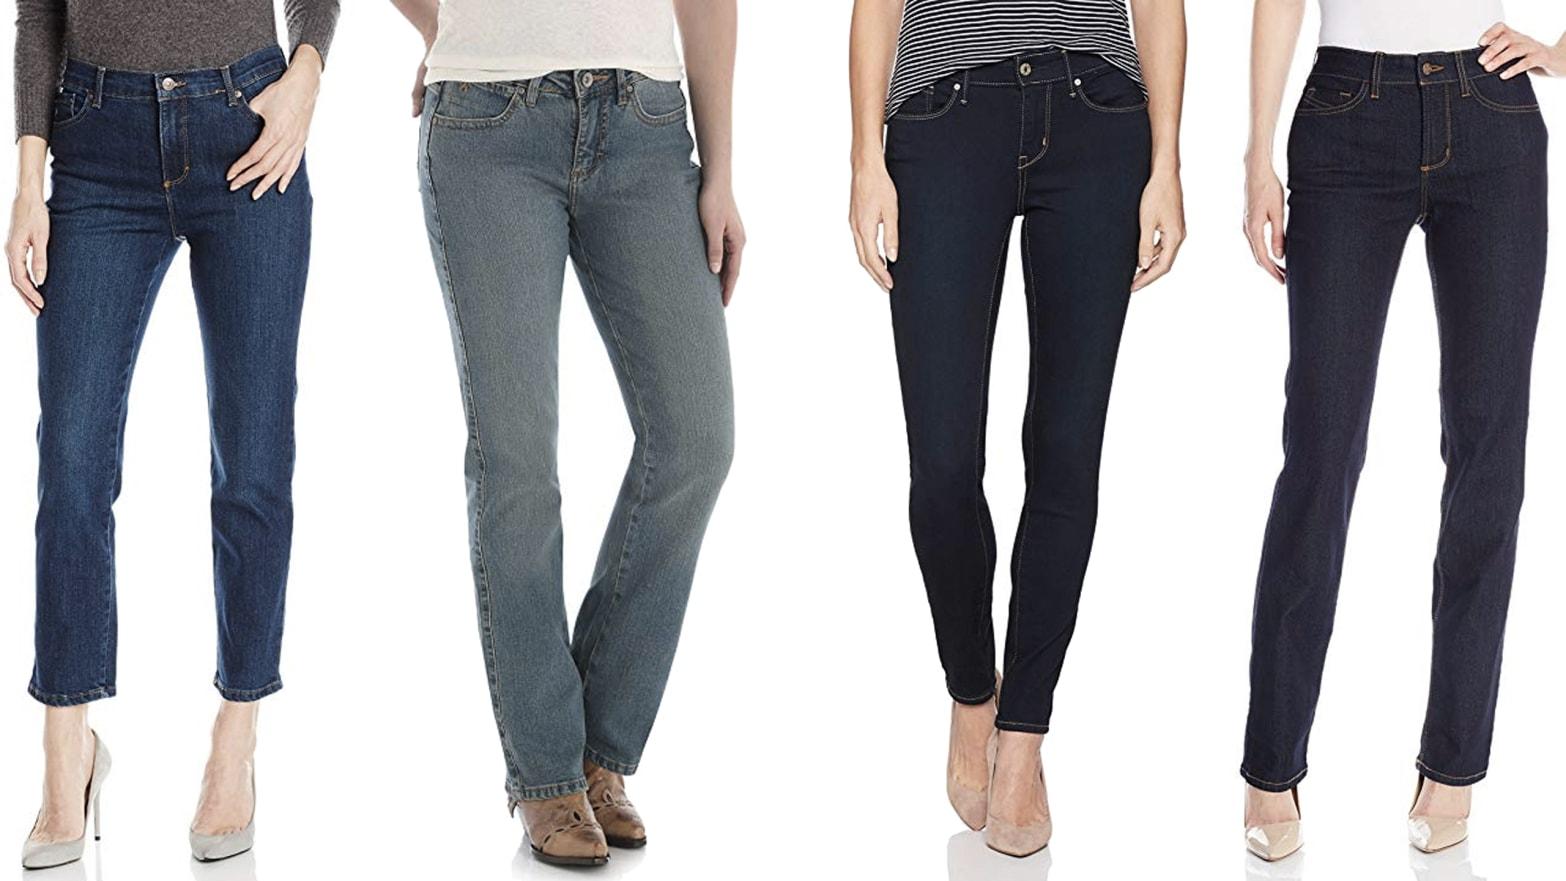 Shop the Best Women's Jeans on Amazon